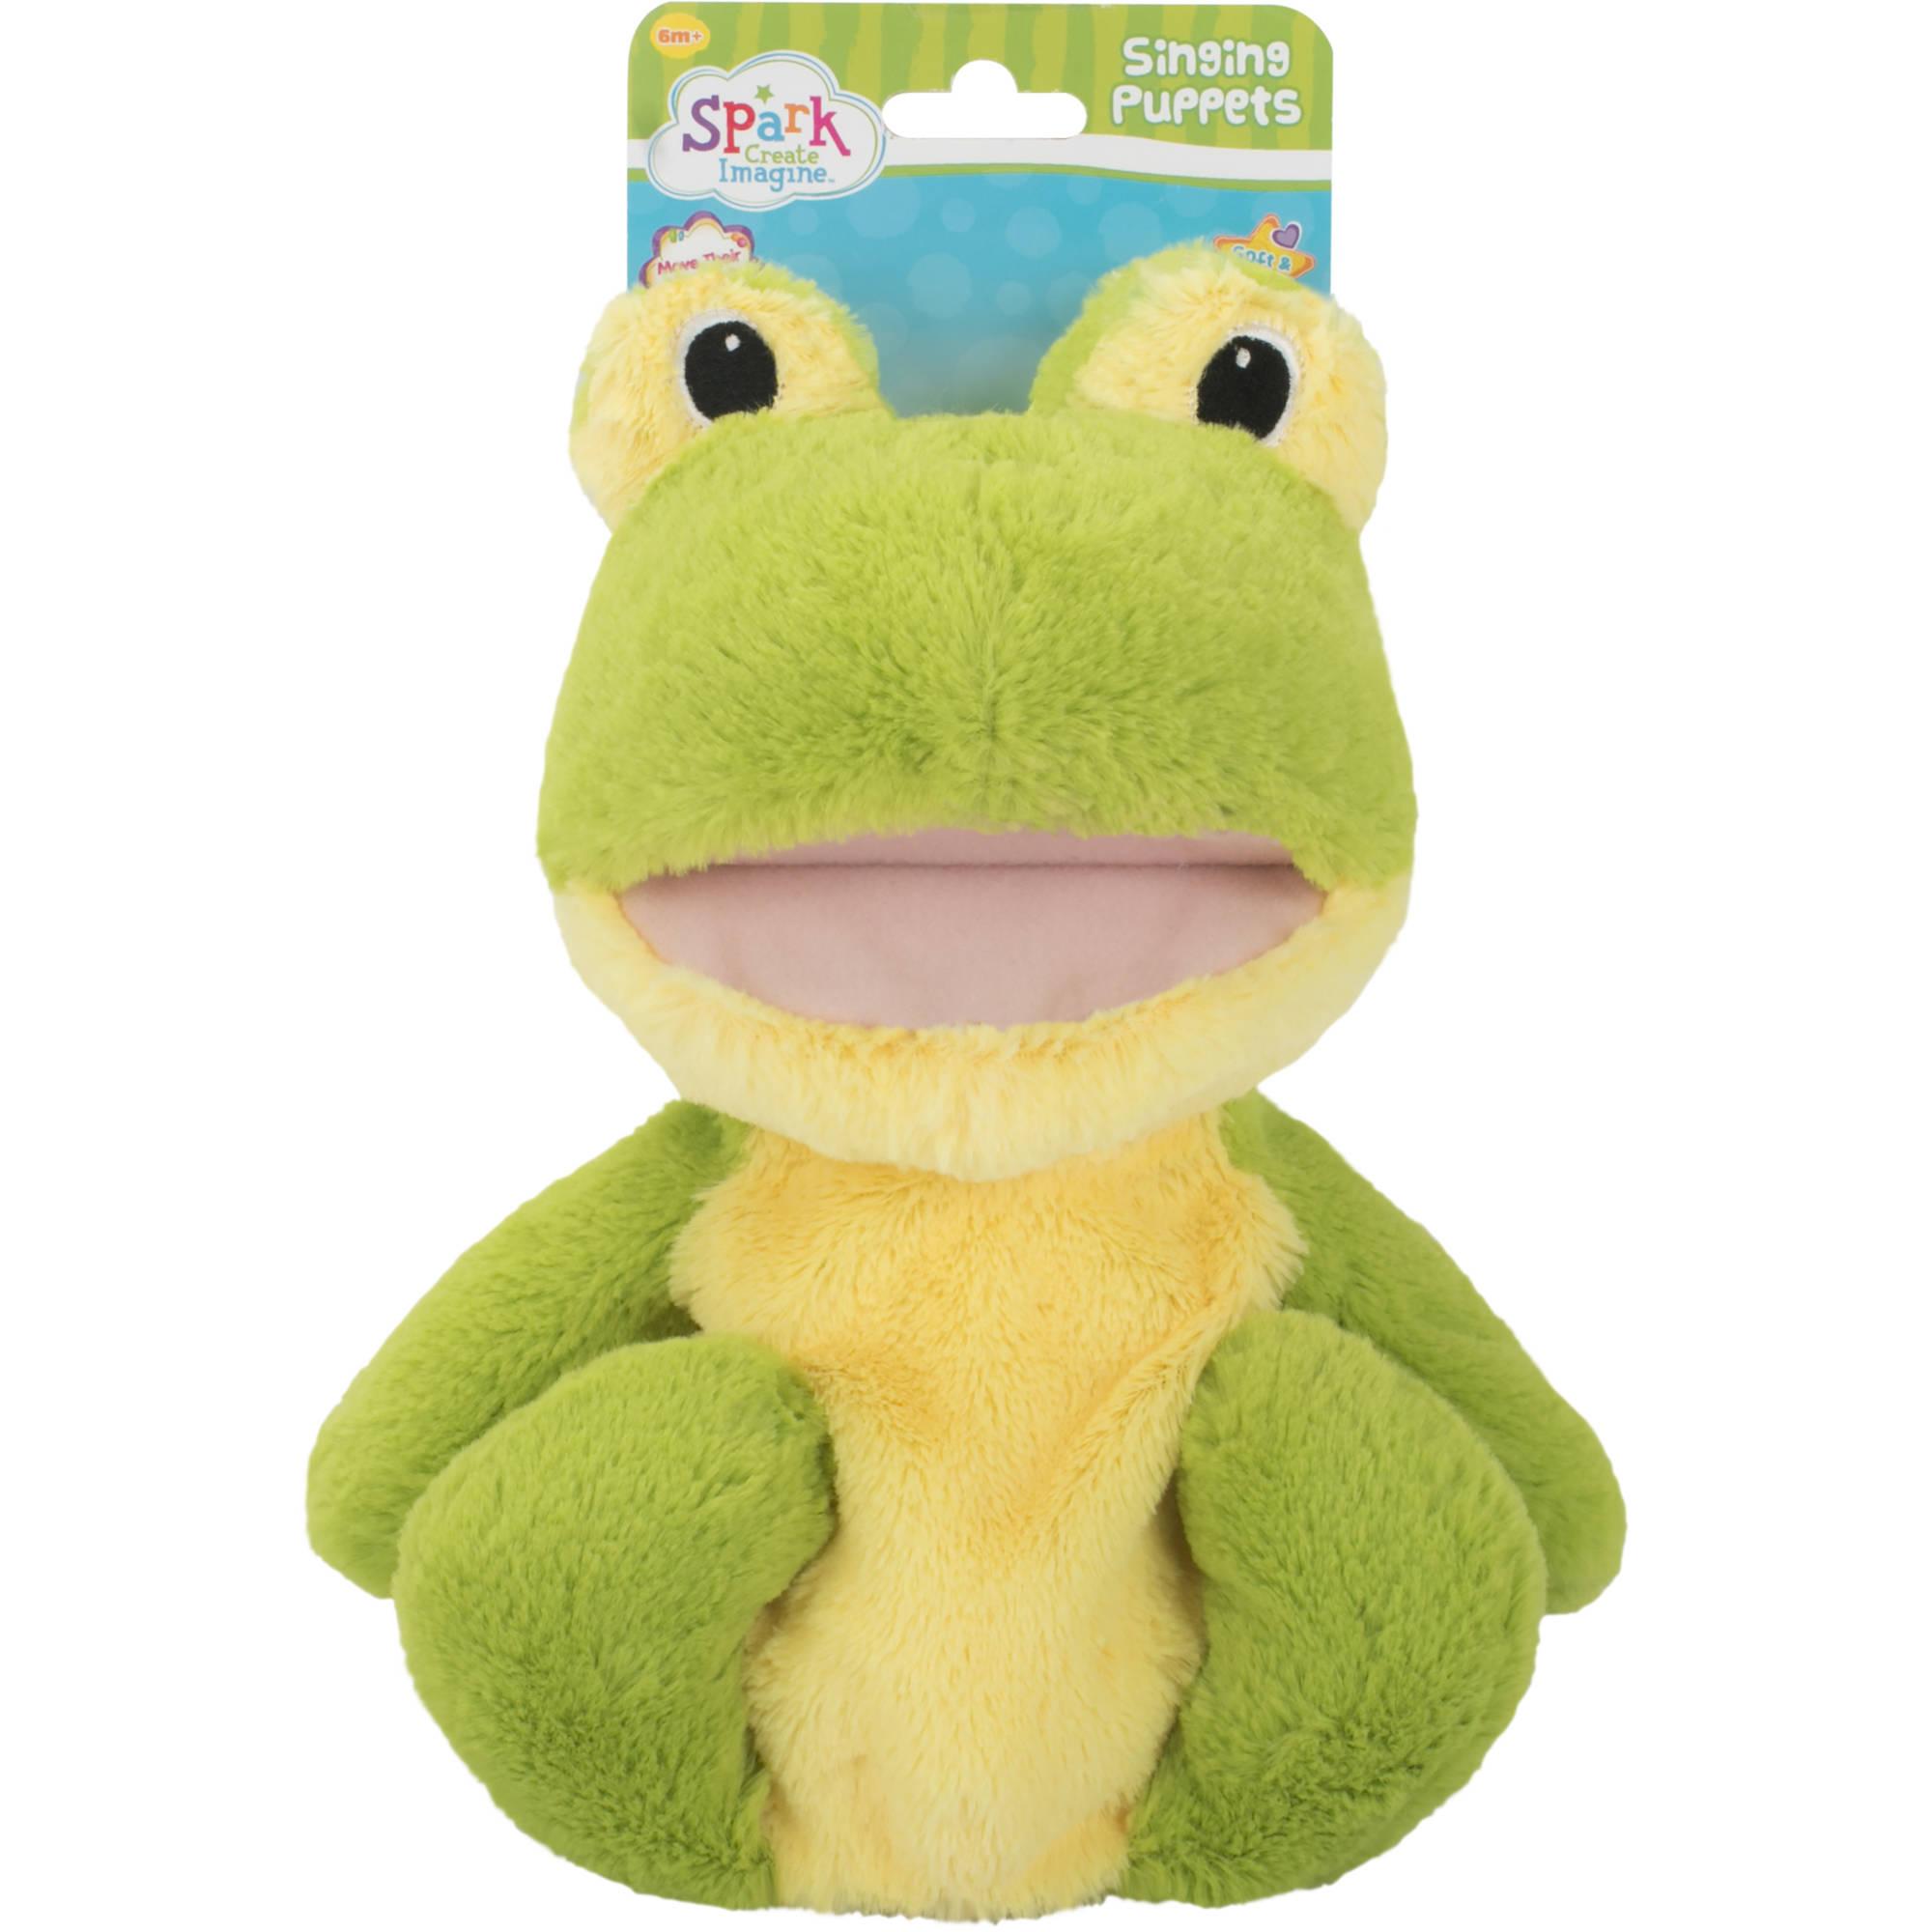 Spark Create Imagine Singing Puppets, Frog